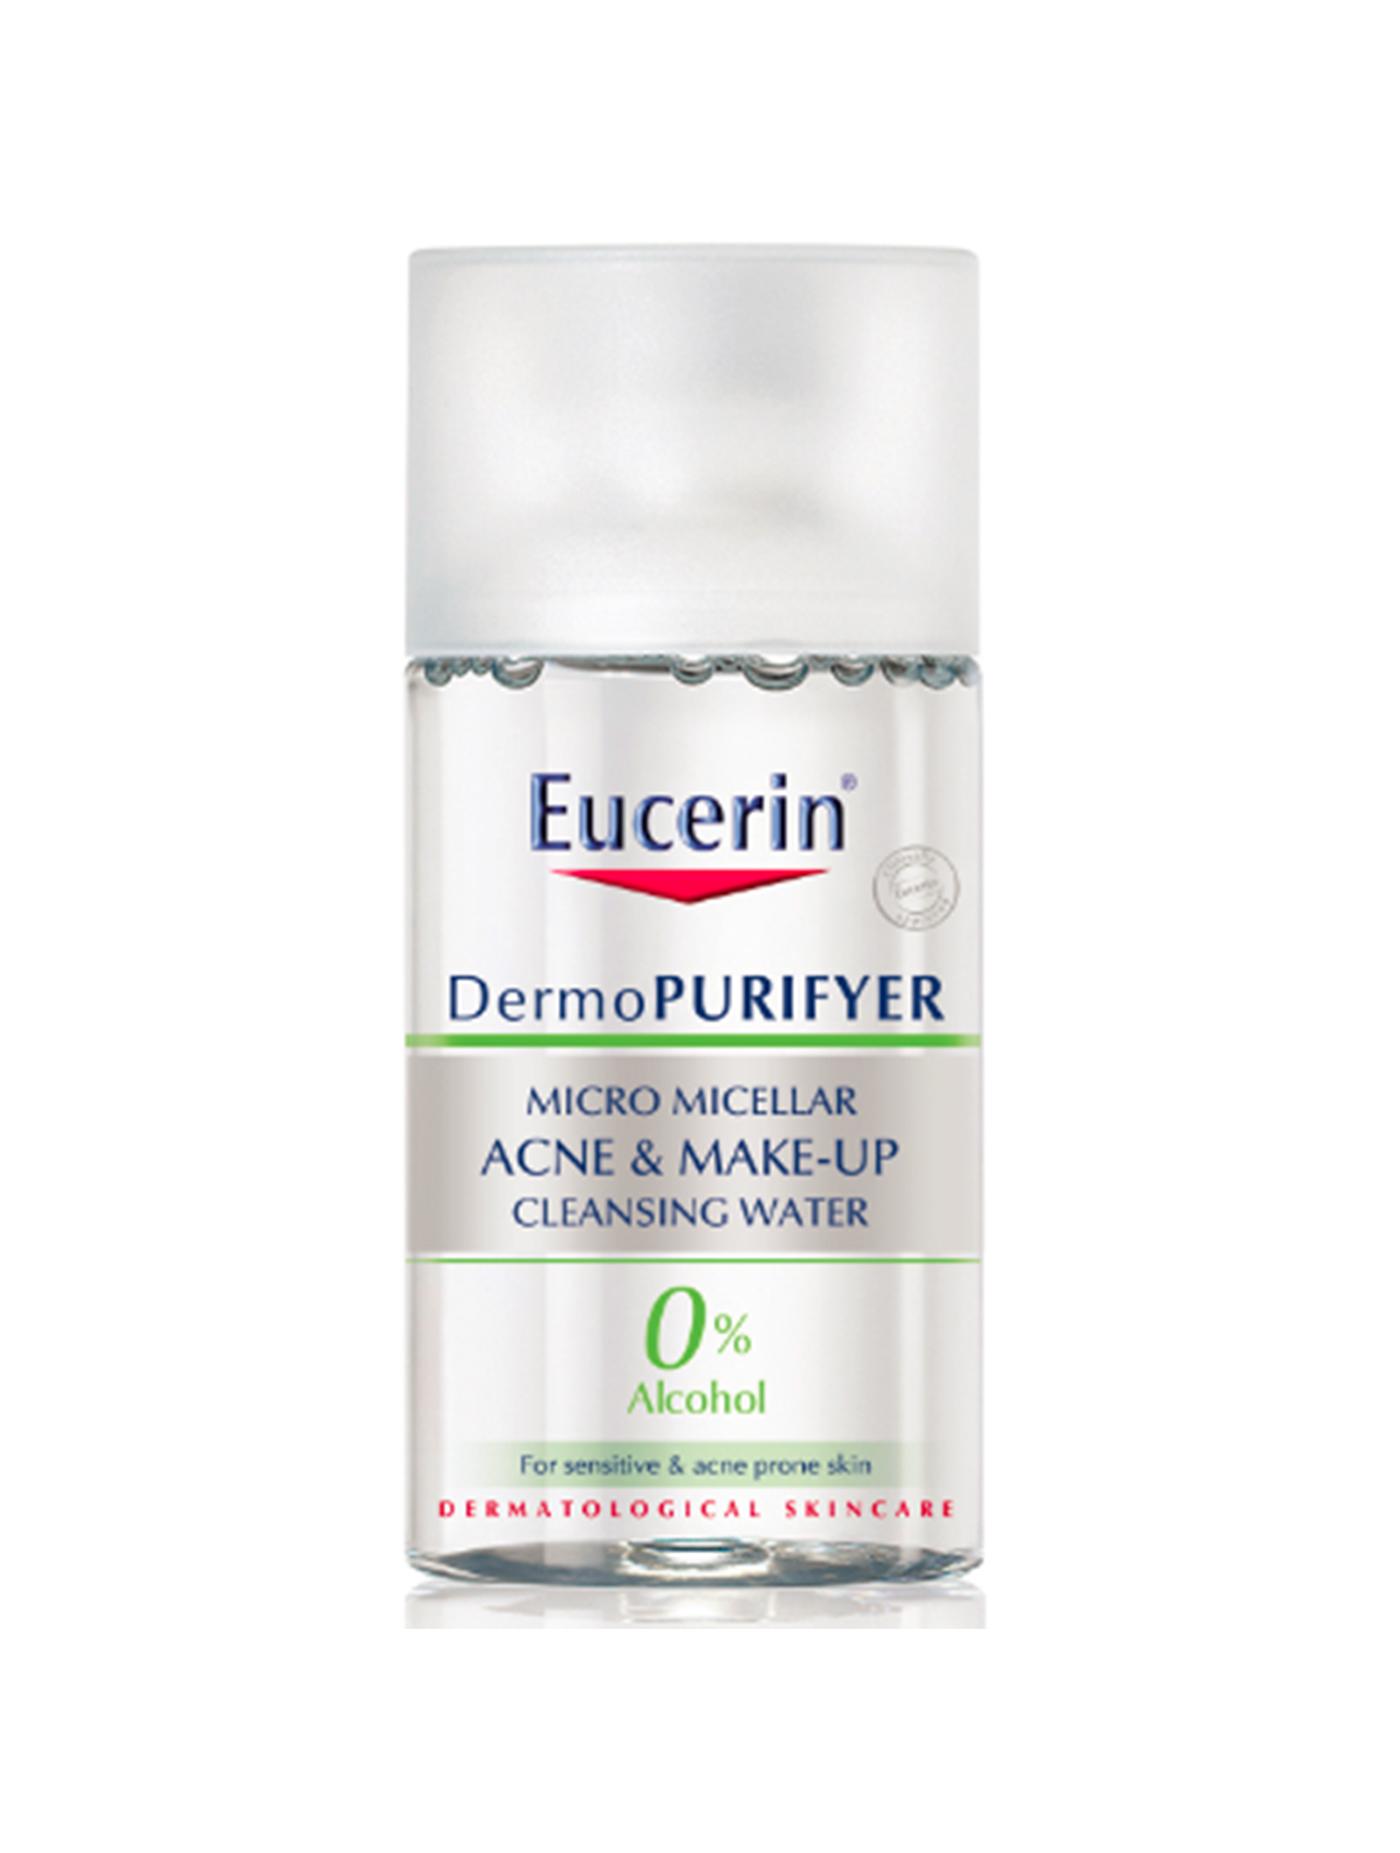 EUCERIN Dermopurifyer Acne & Make-up Cleansing Water 125 ml.